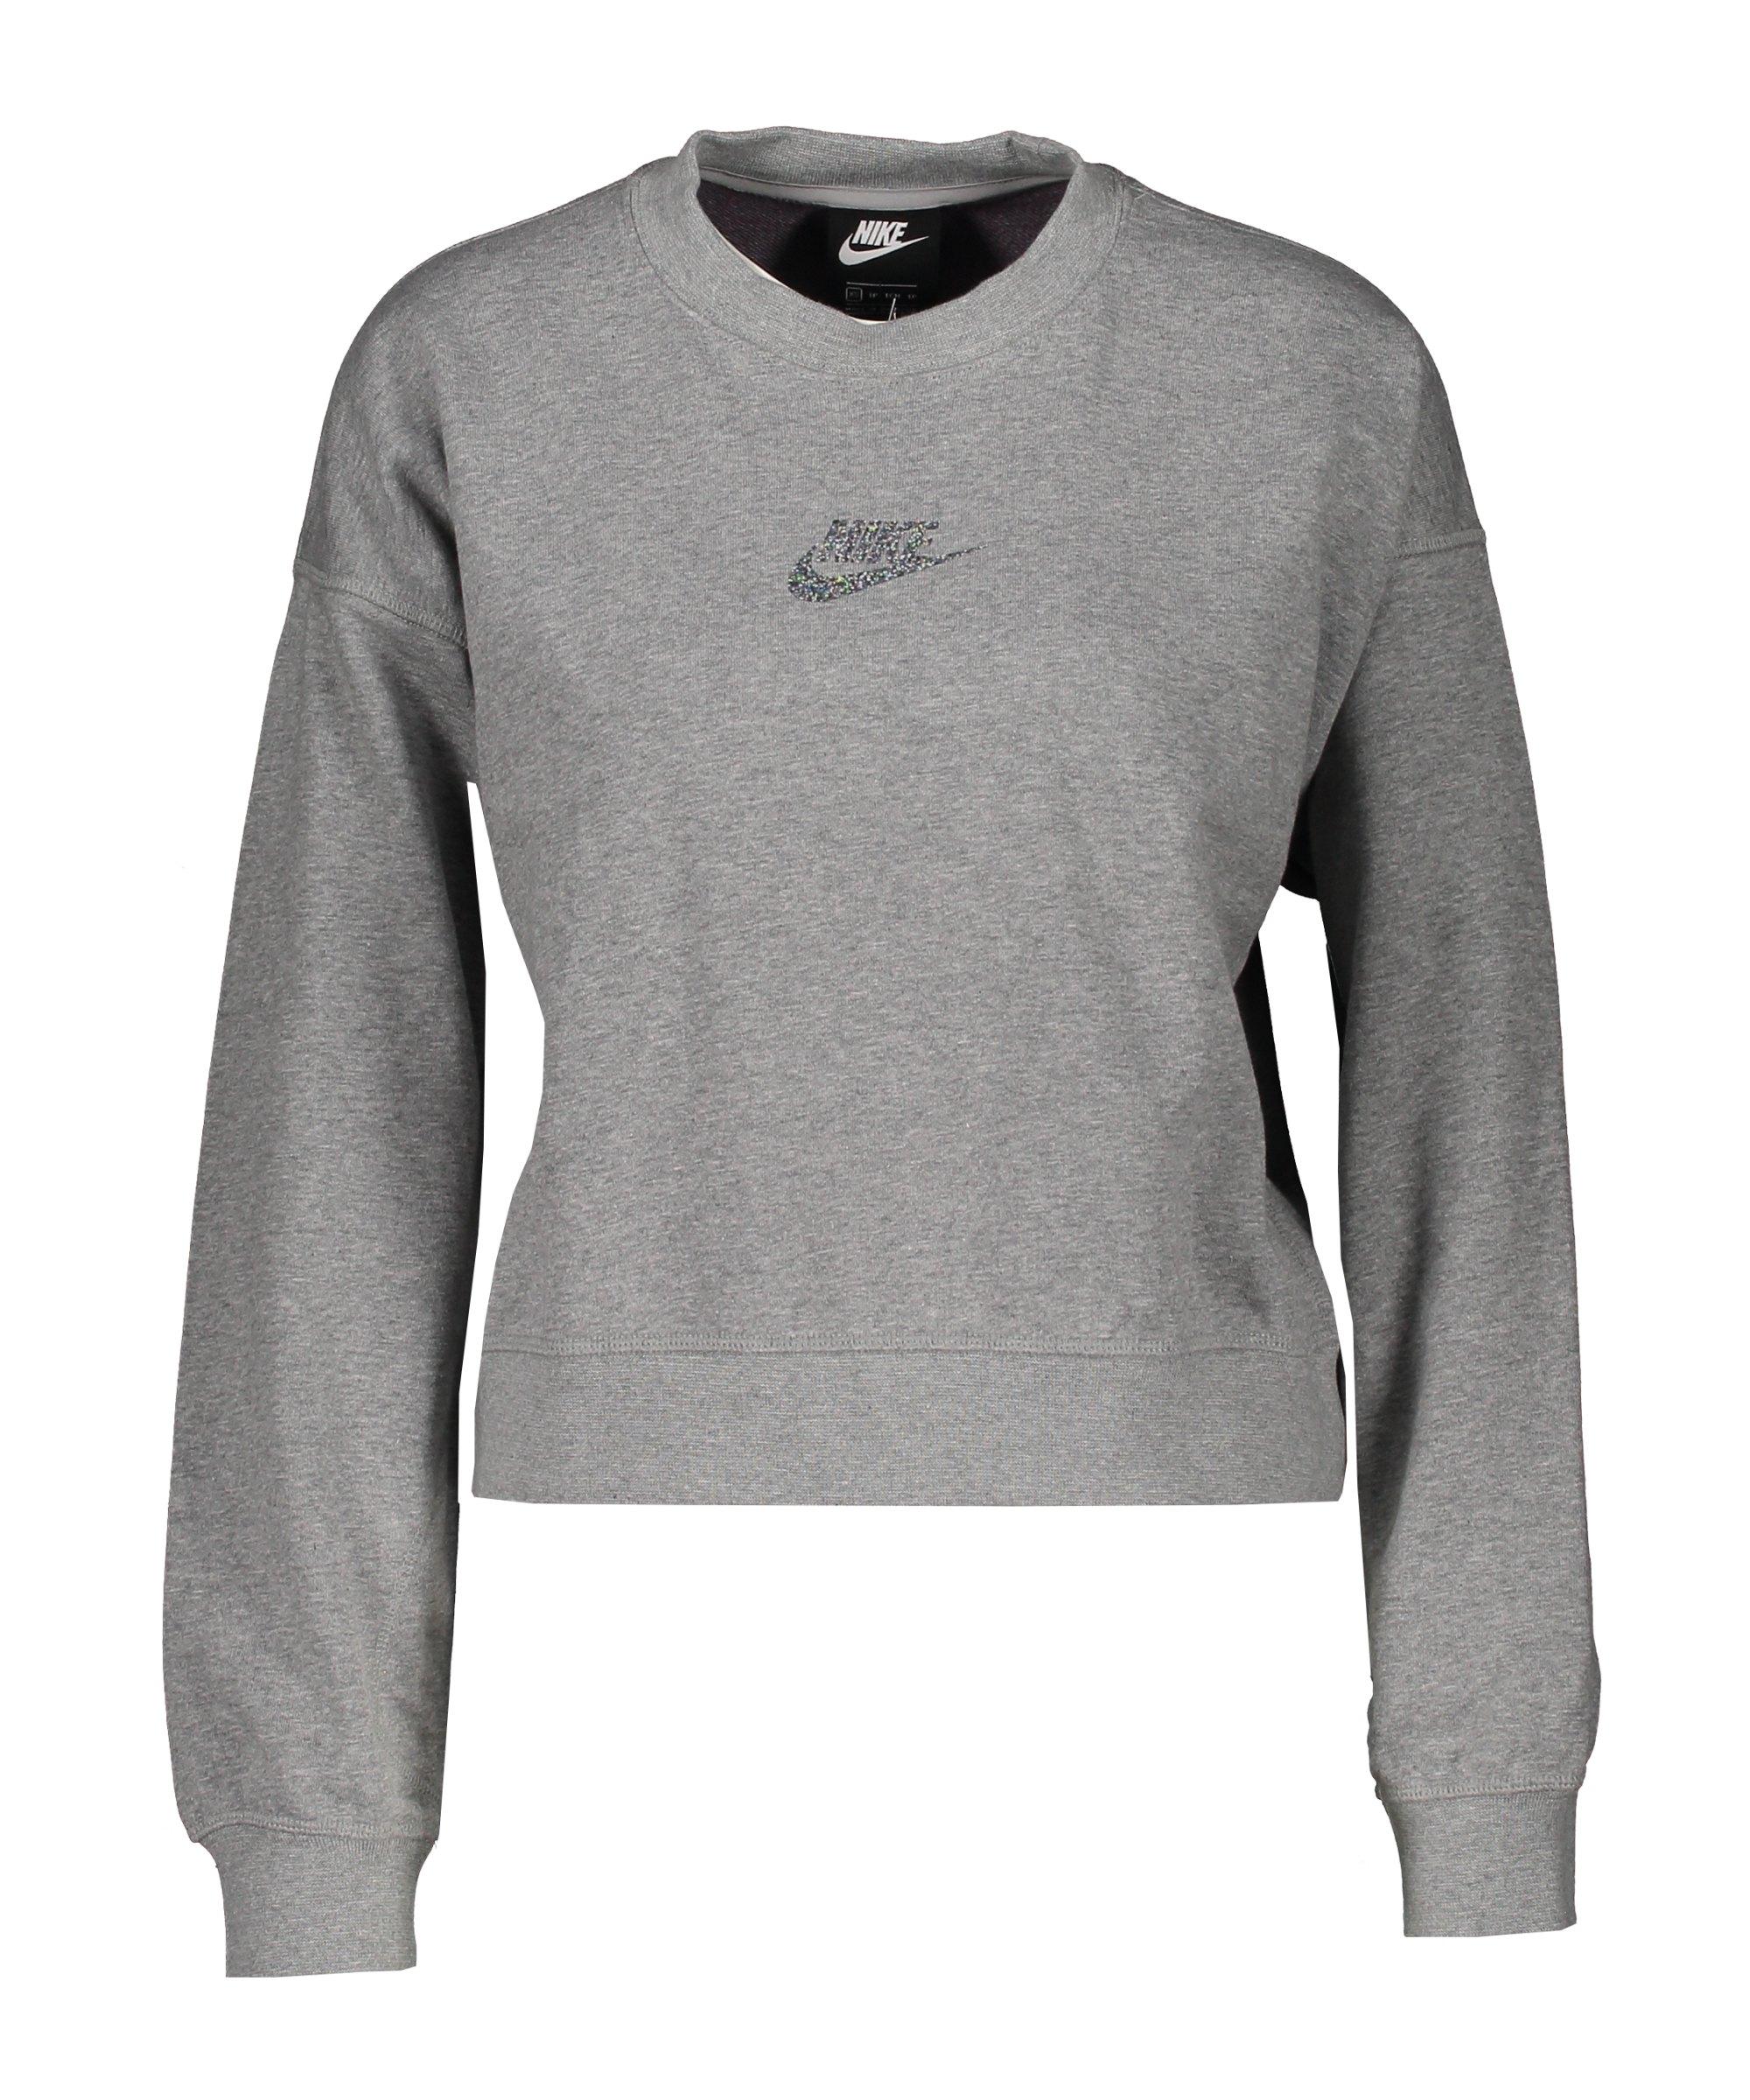 Nike Sportswear Crew Sweatshirt Damen Grau F063 - grau